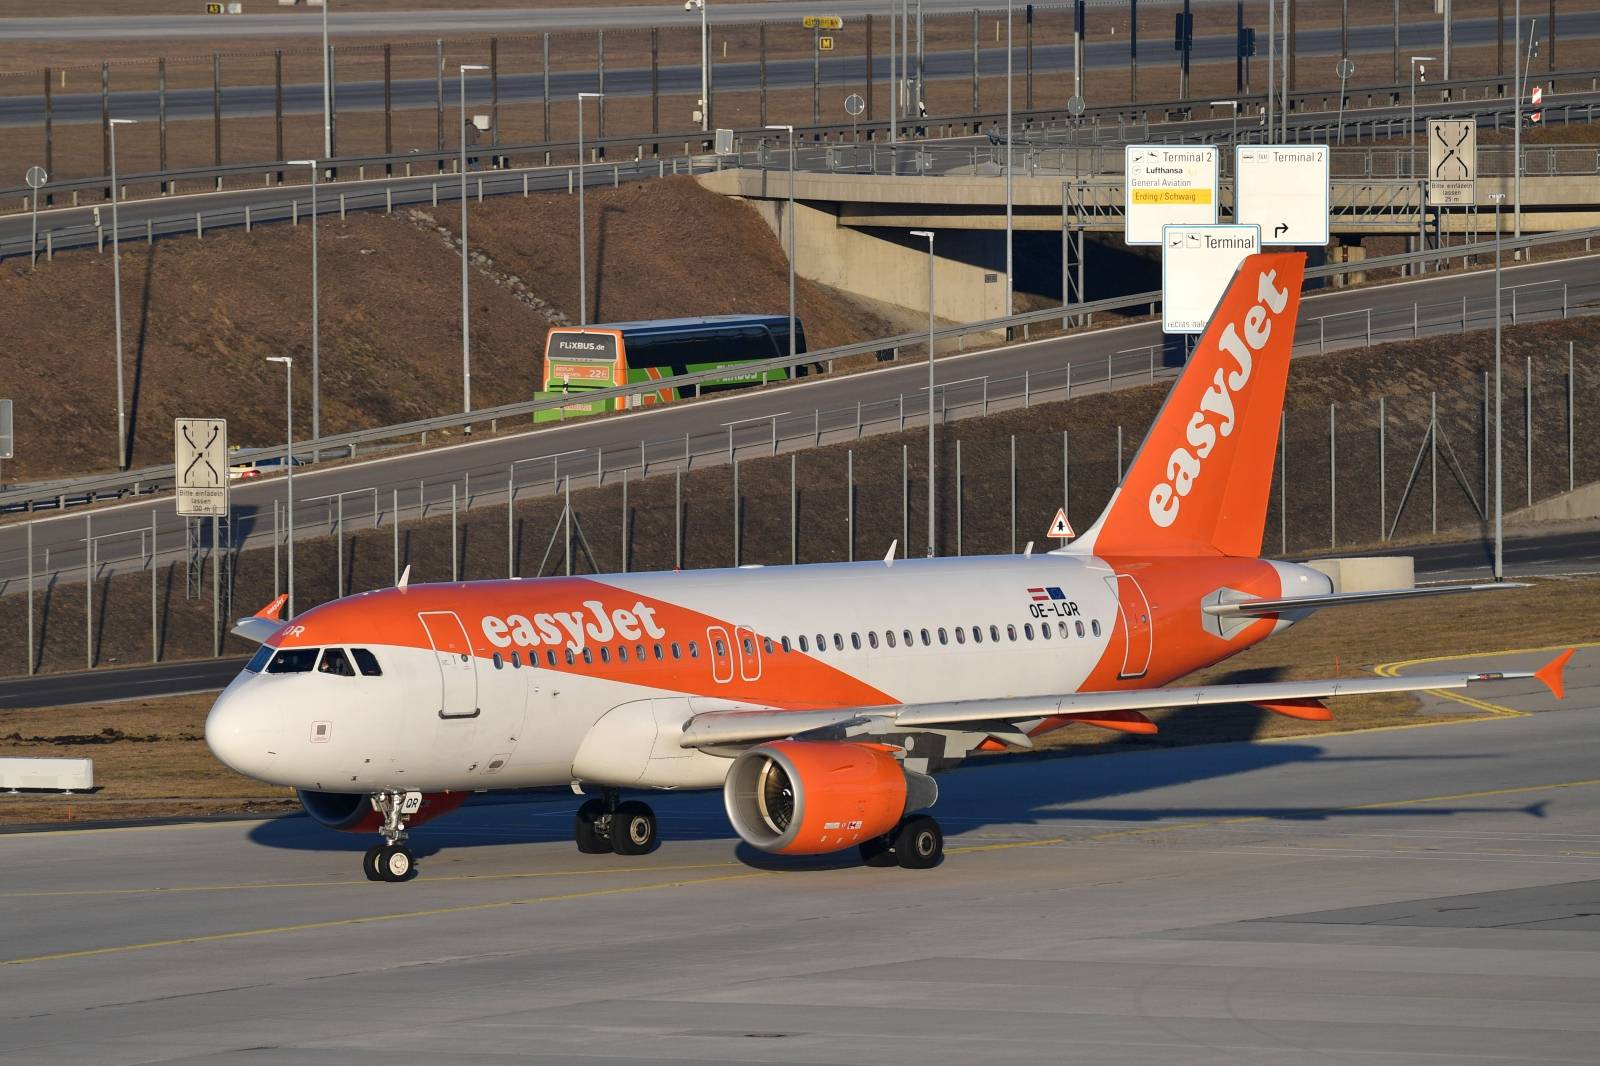 Aircraft at Munich Airport.